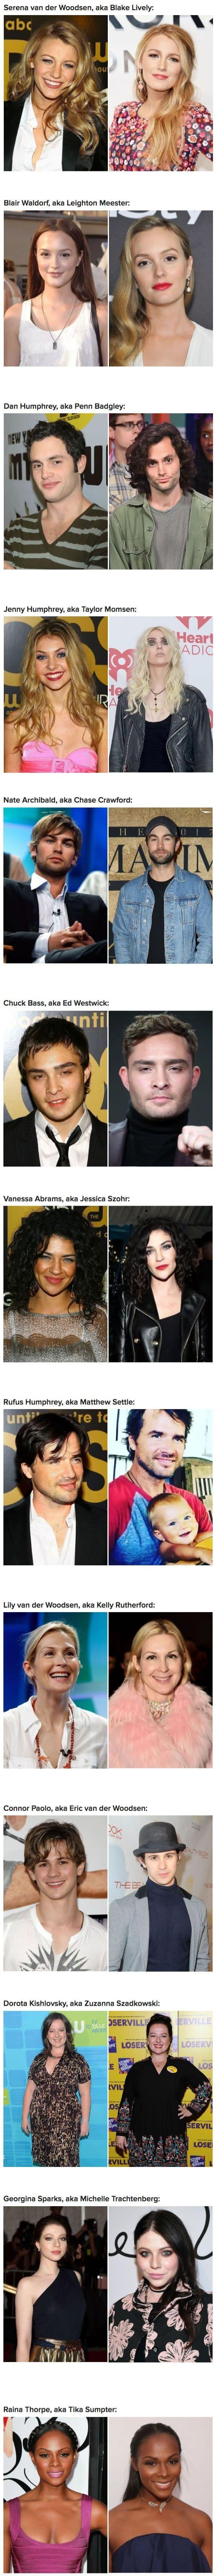 Cast of Gossip Girl: 10 years ago vs today